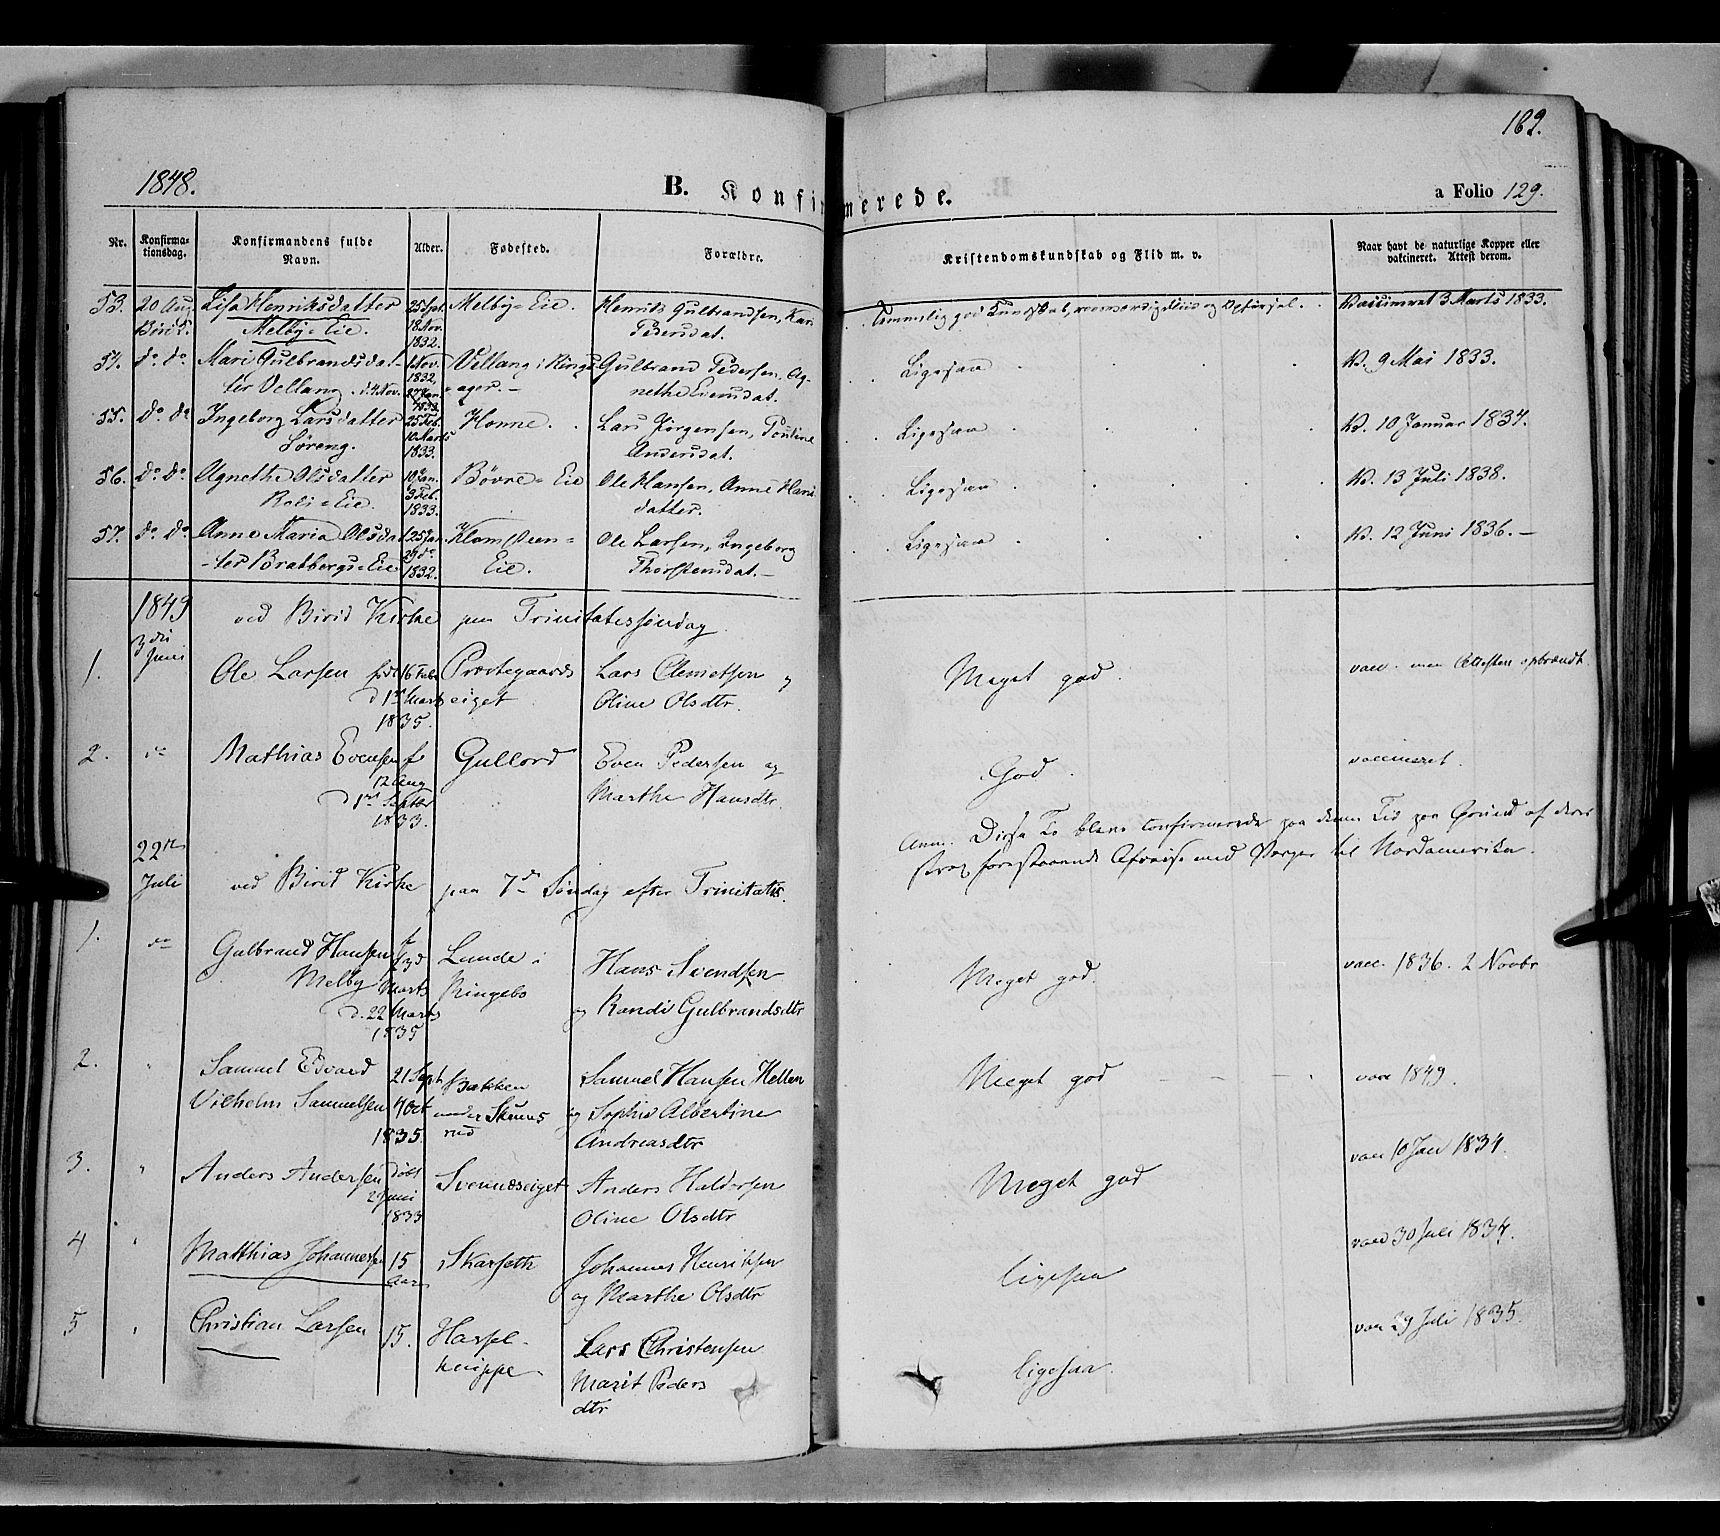 SAH, Biri prestekontor, Ministerialbok nr. 5, 1843-1854, s. 162